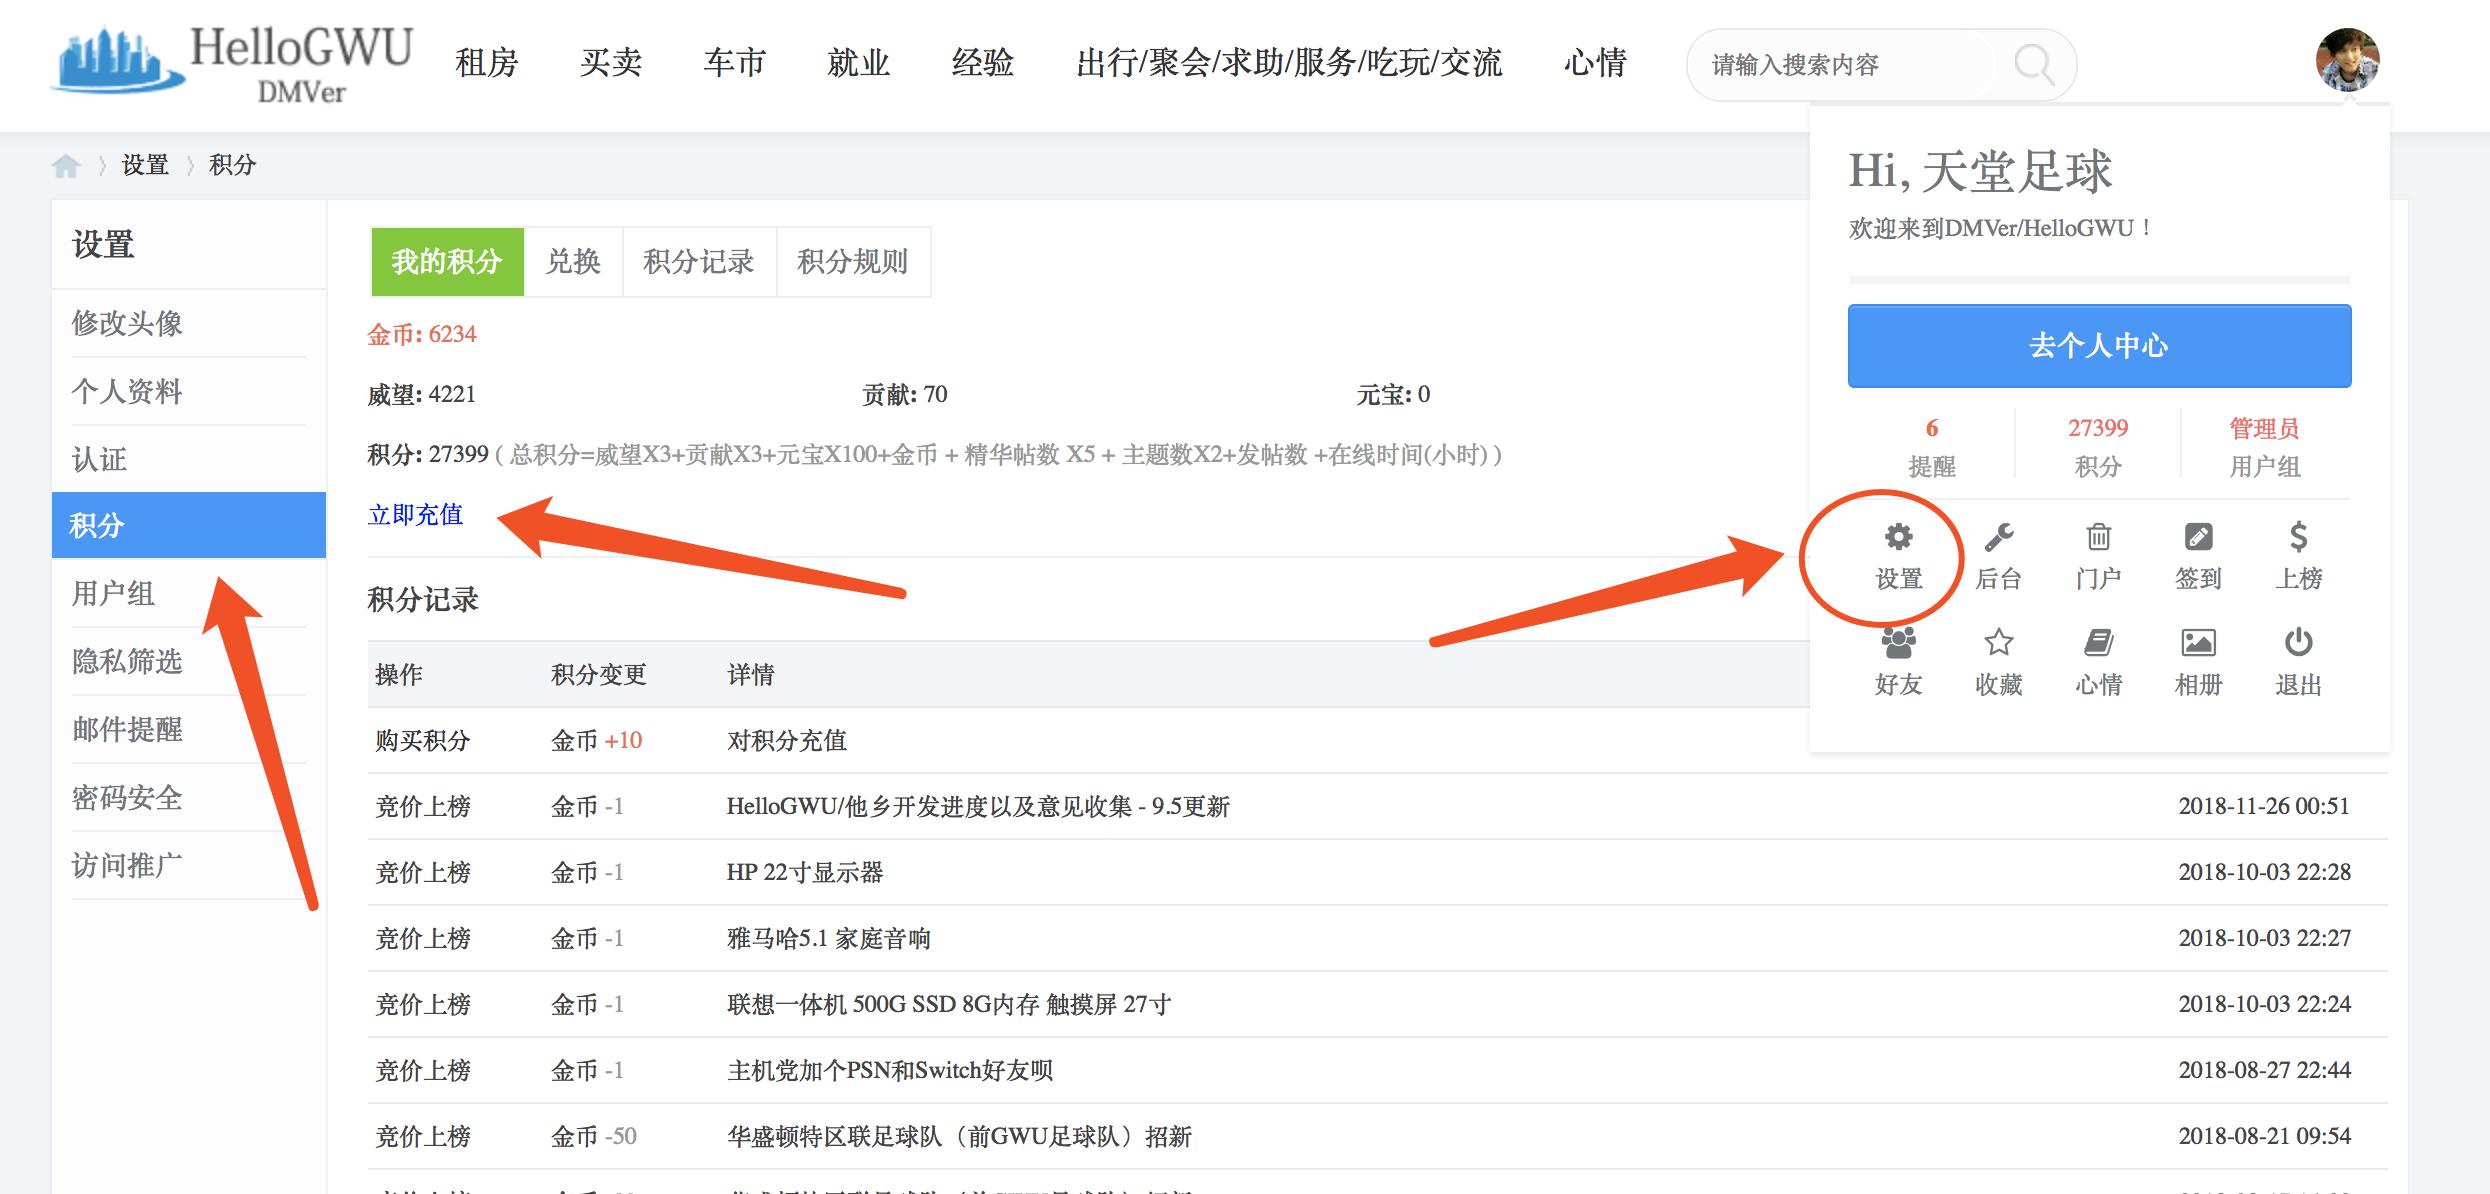 HelloGWU网站升级 & LOGO有偿征集活动插图(1)